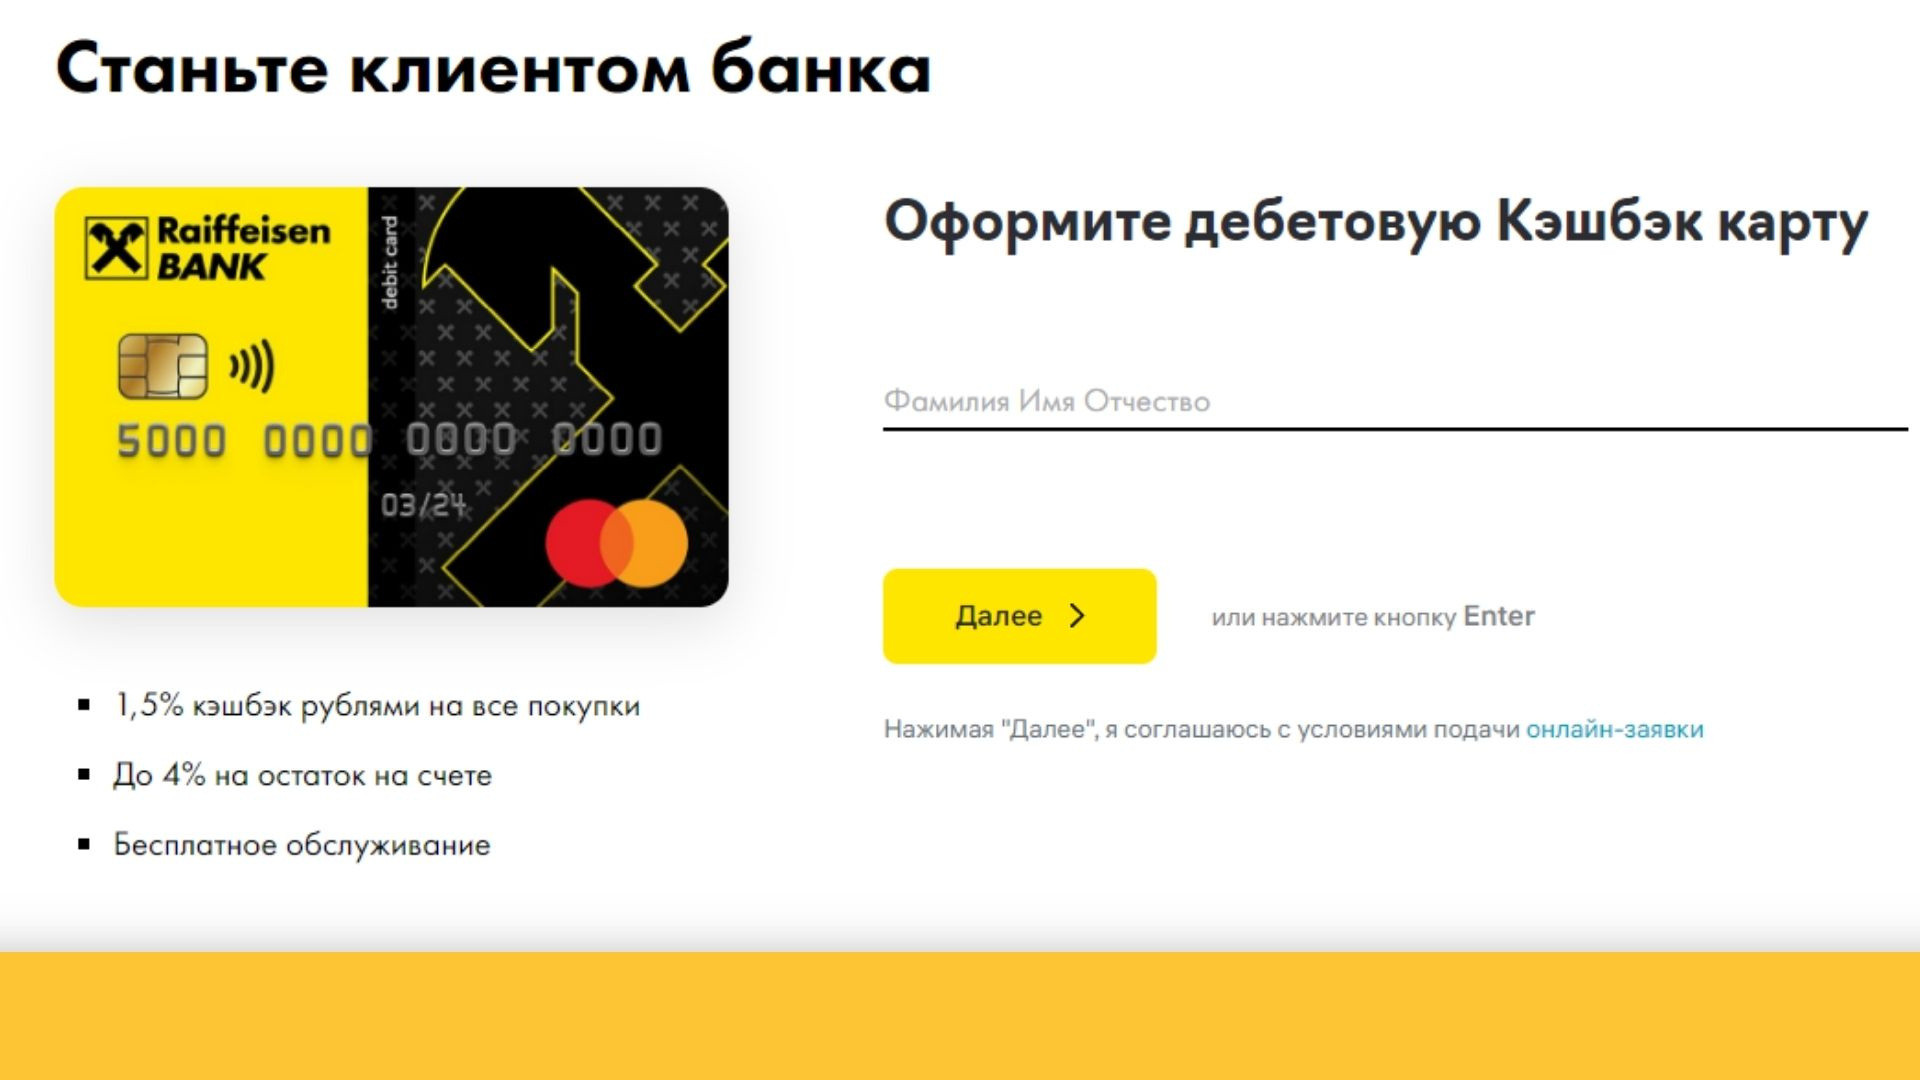 Дебетовая карта с кэшбэком на всё Райффайзен Форма онлайн заявки Заказать